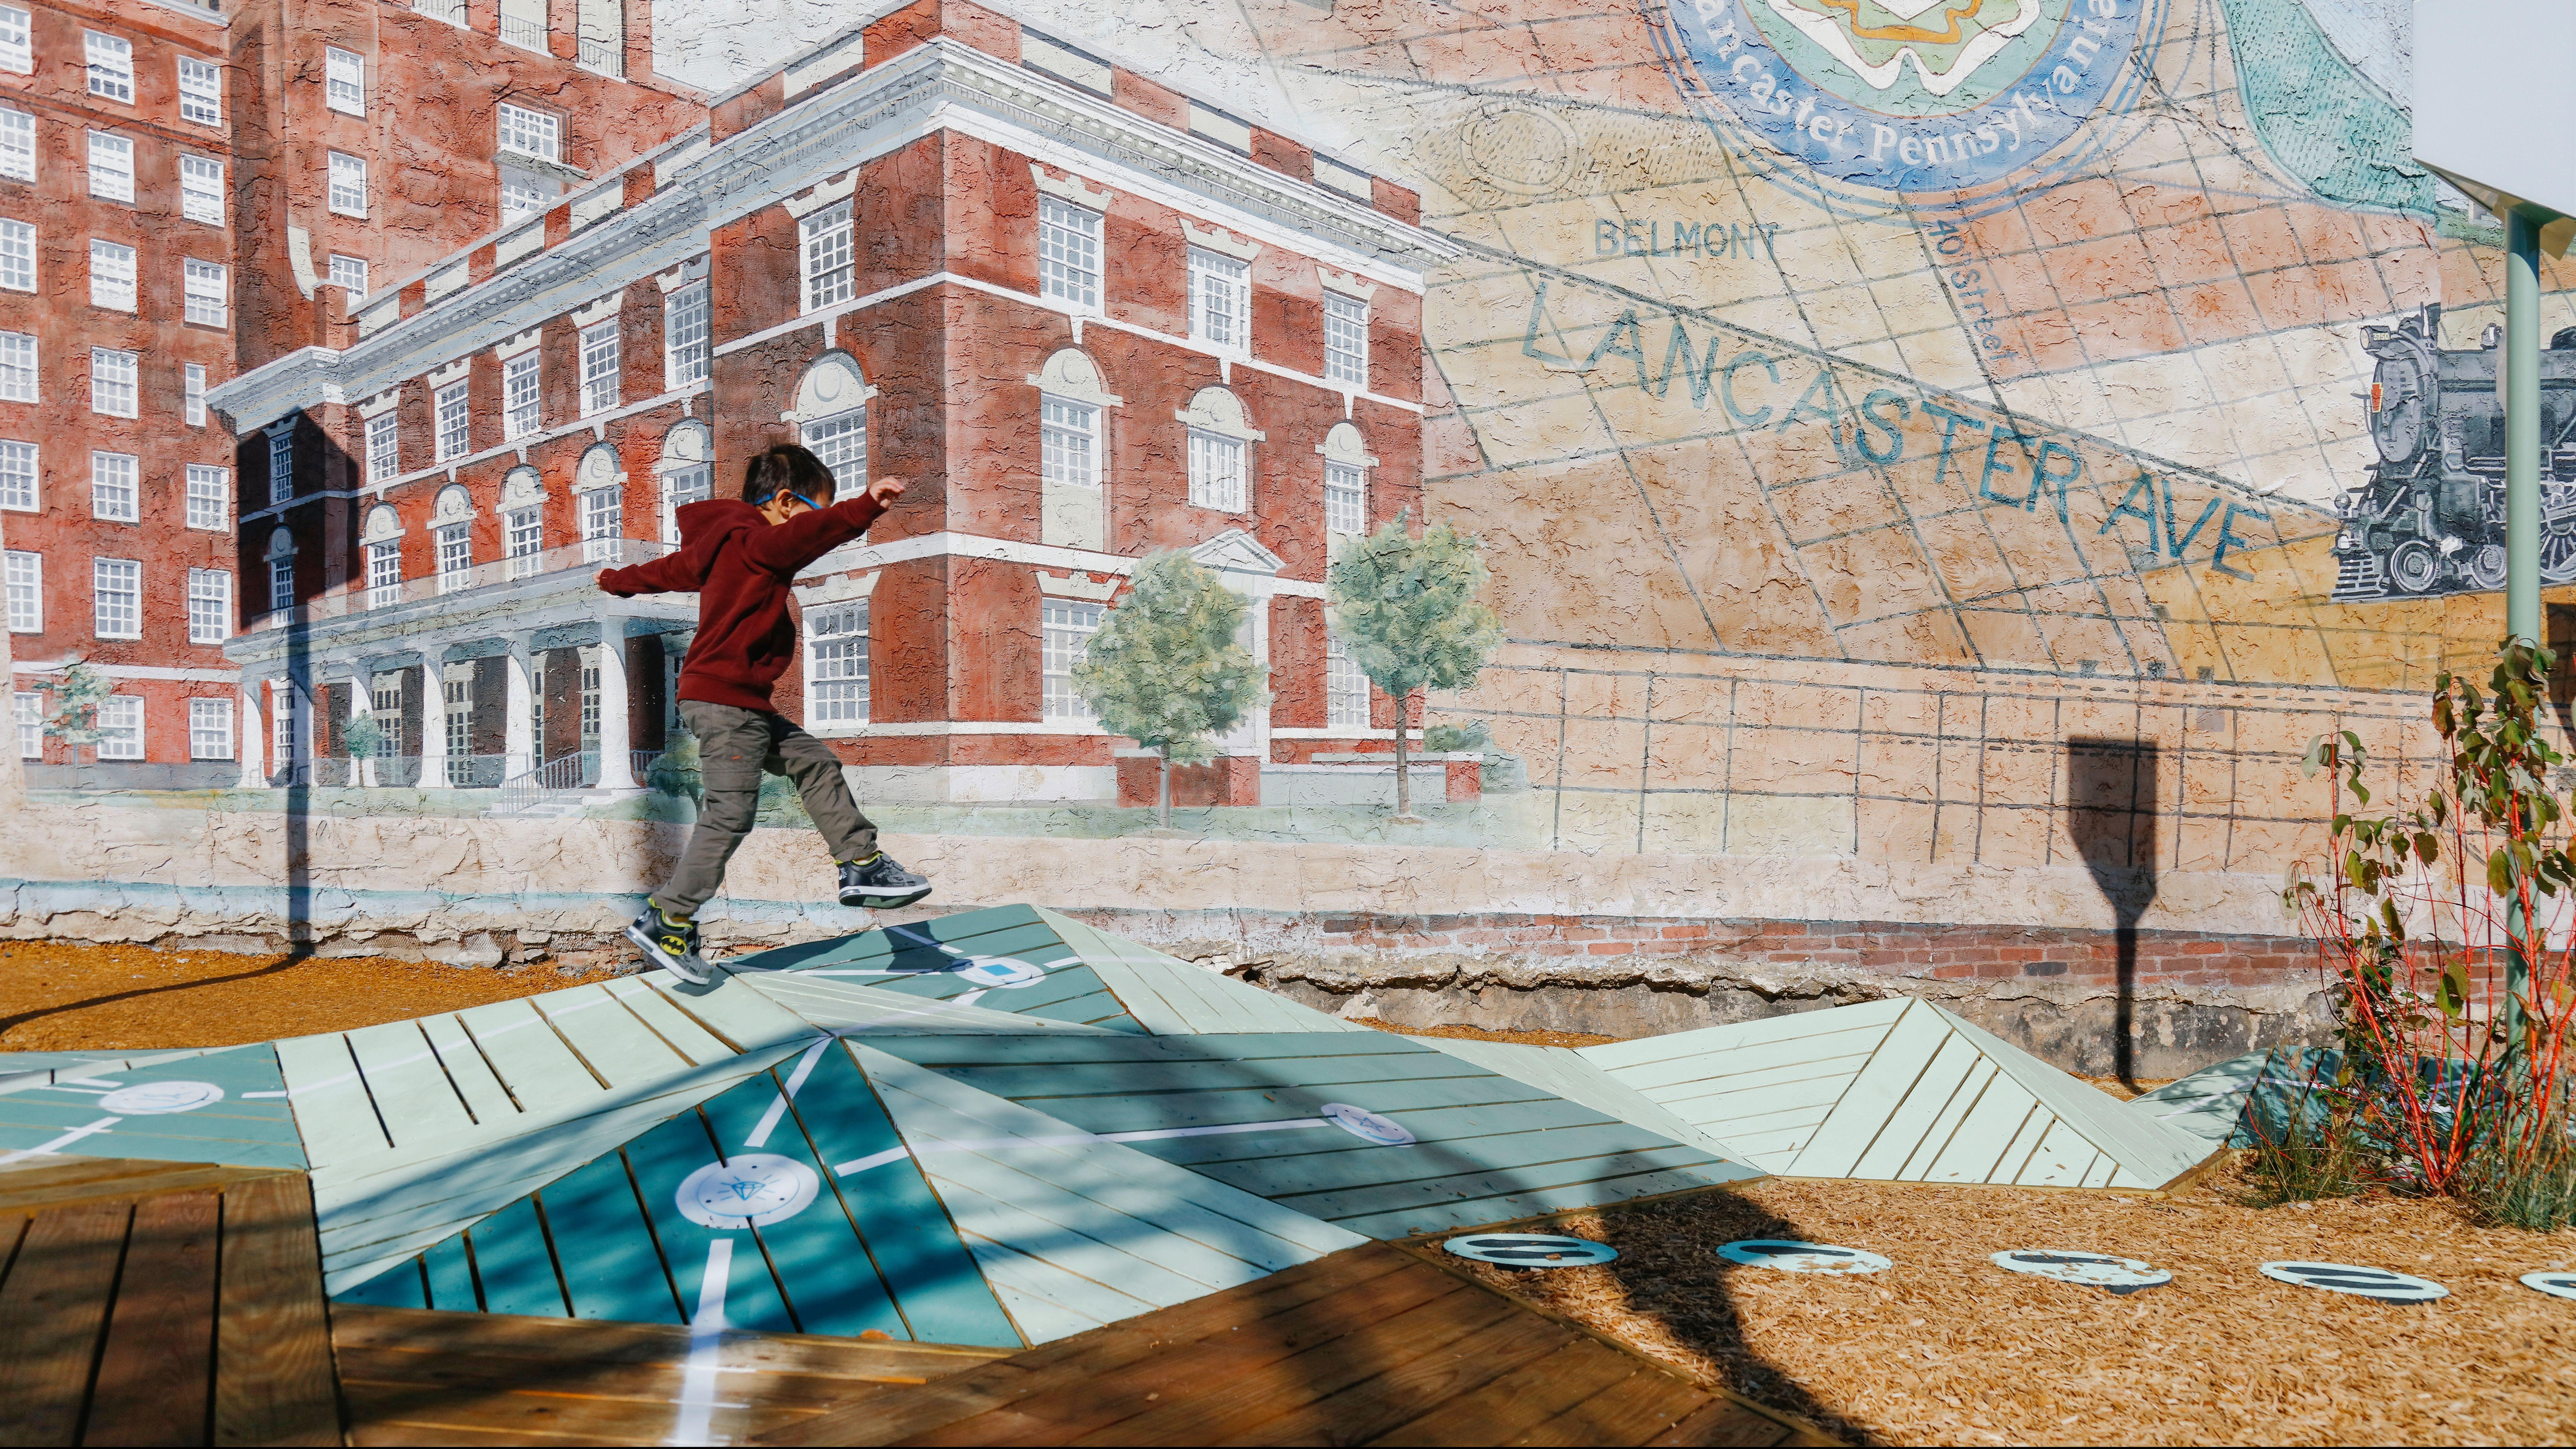 The Urban Thinkscape playground in Belmont, Philadelphia.